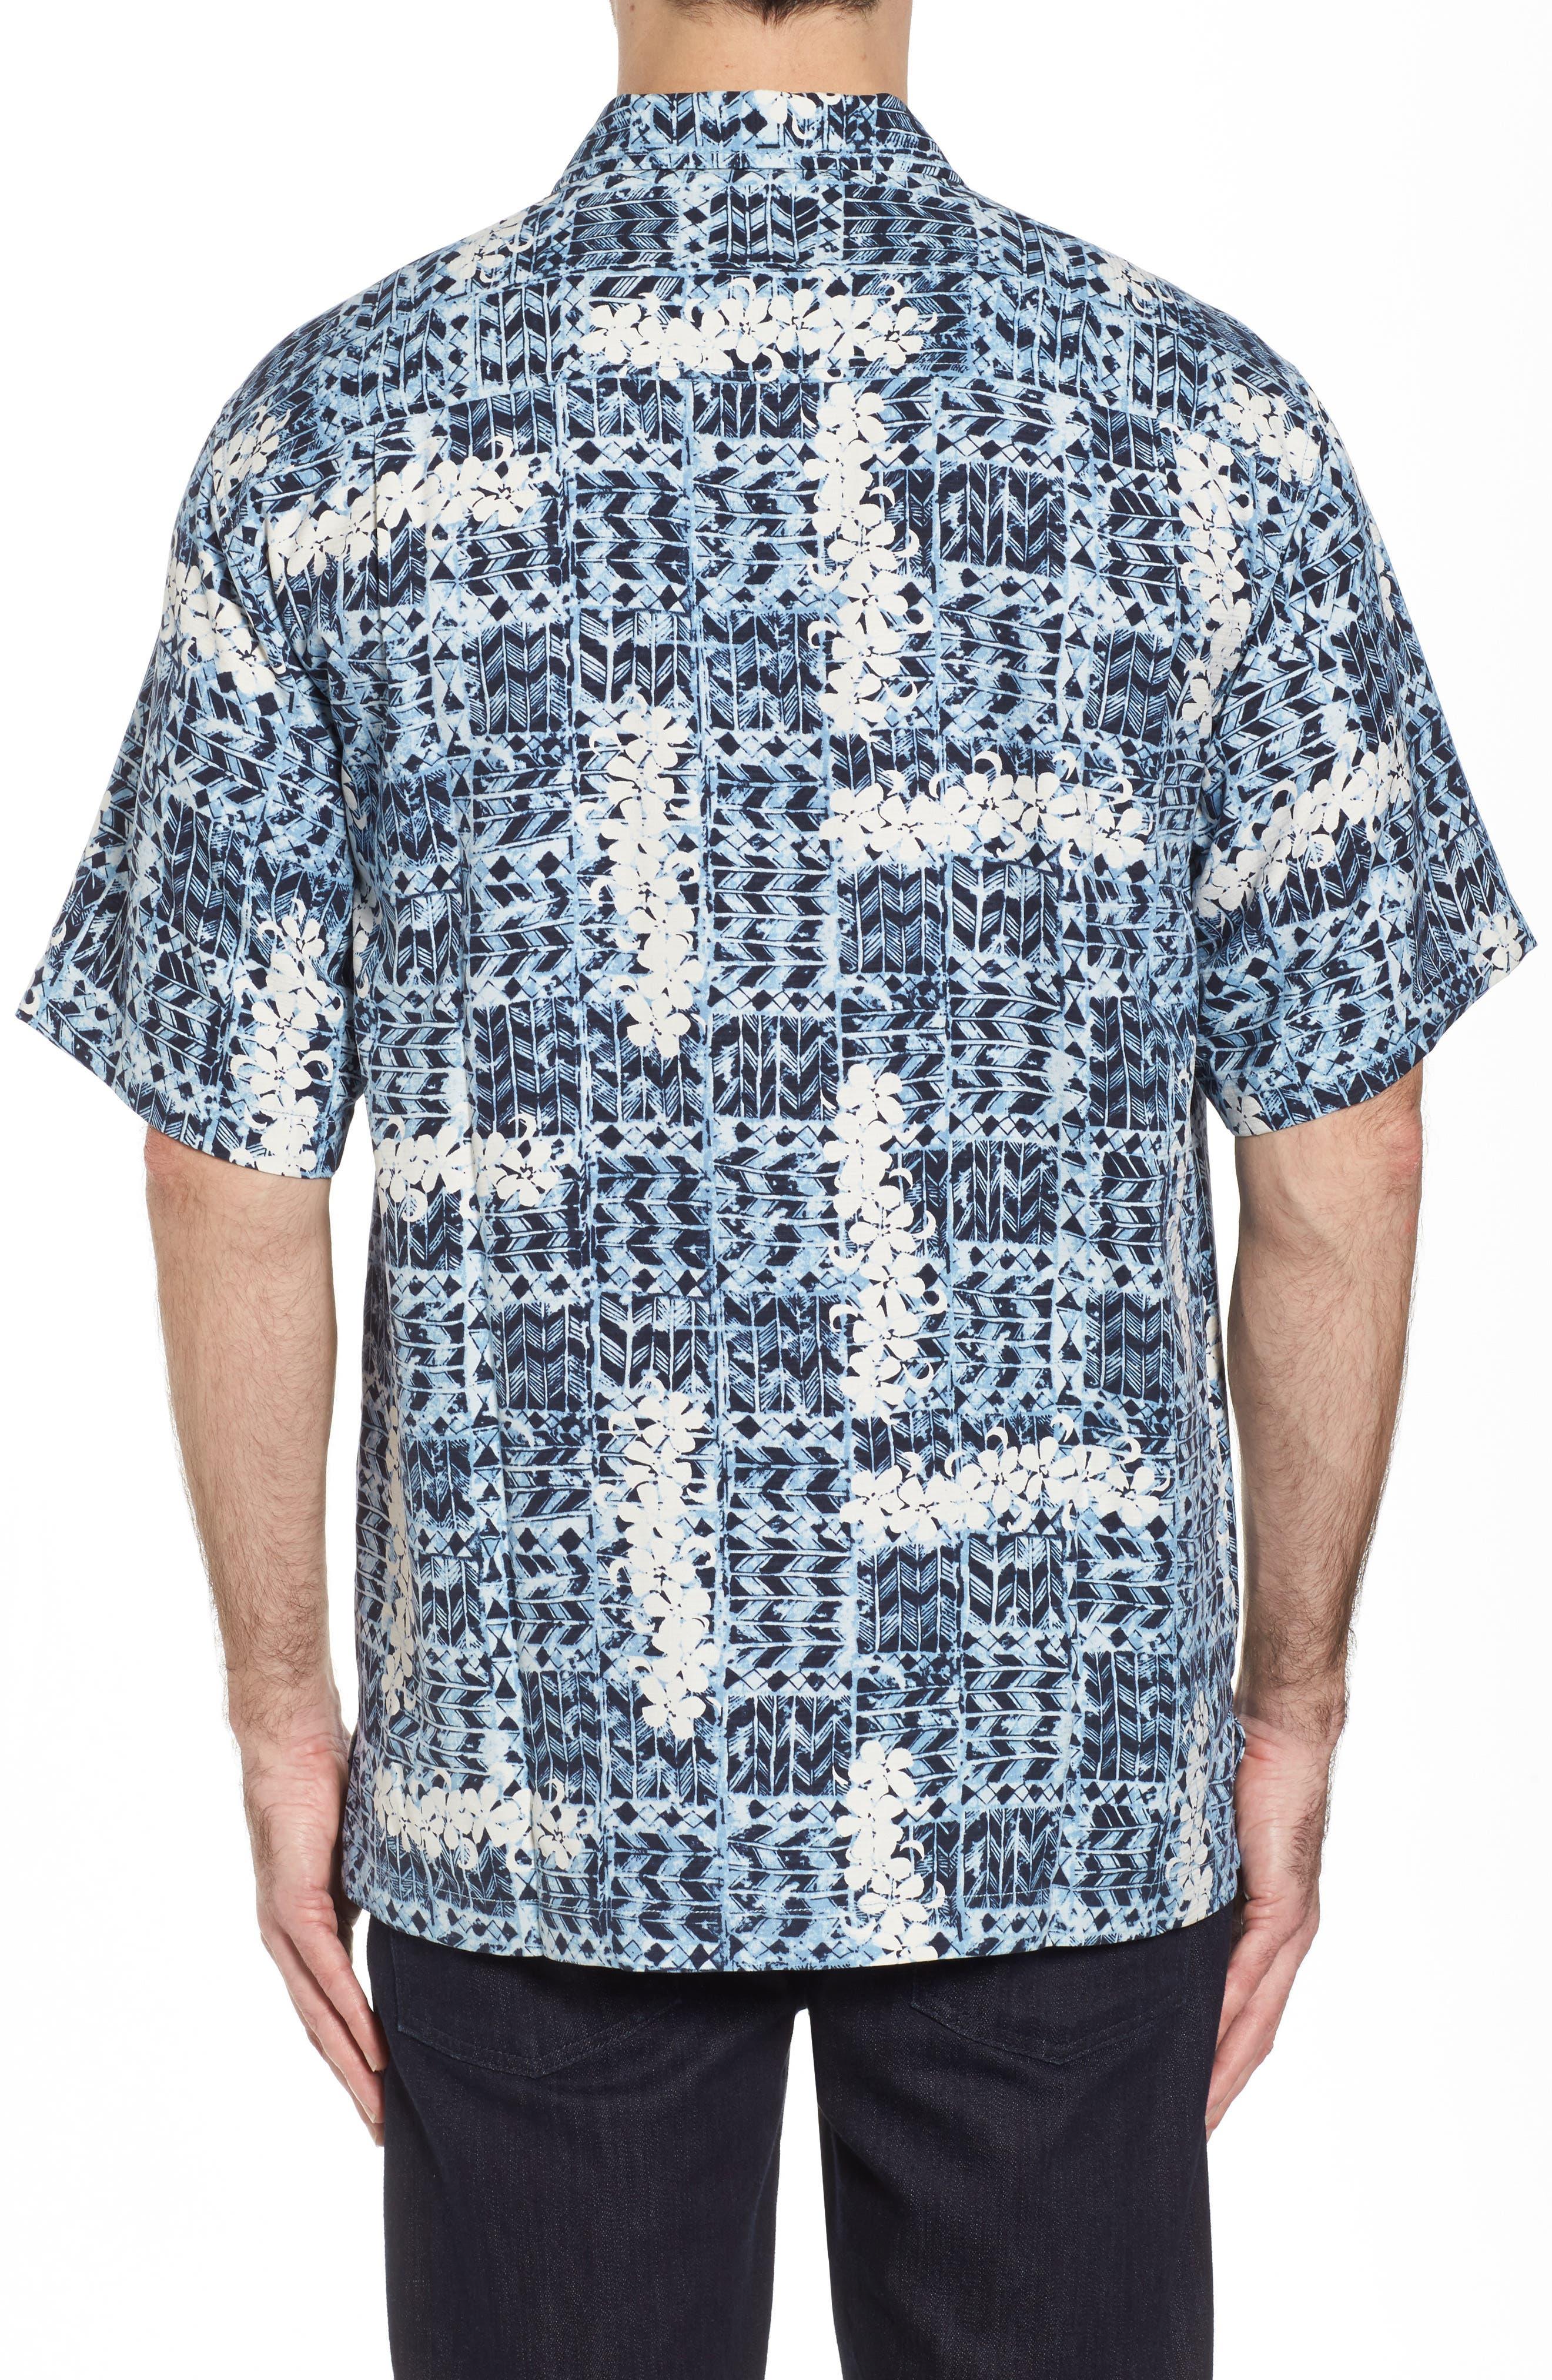 Olei Olei Silk Camp Shirt,                             Alternate thumbnail 2, color,                             Bering Blue